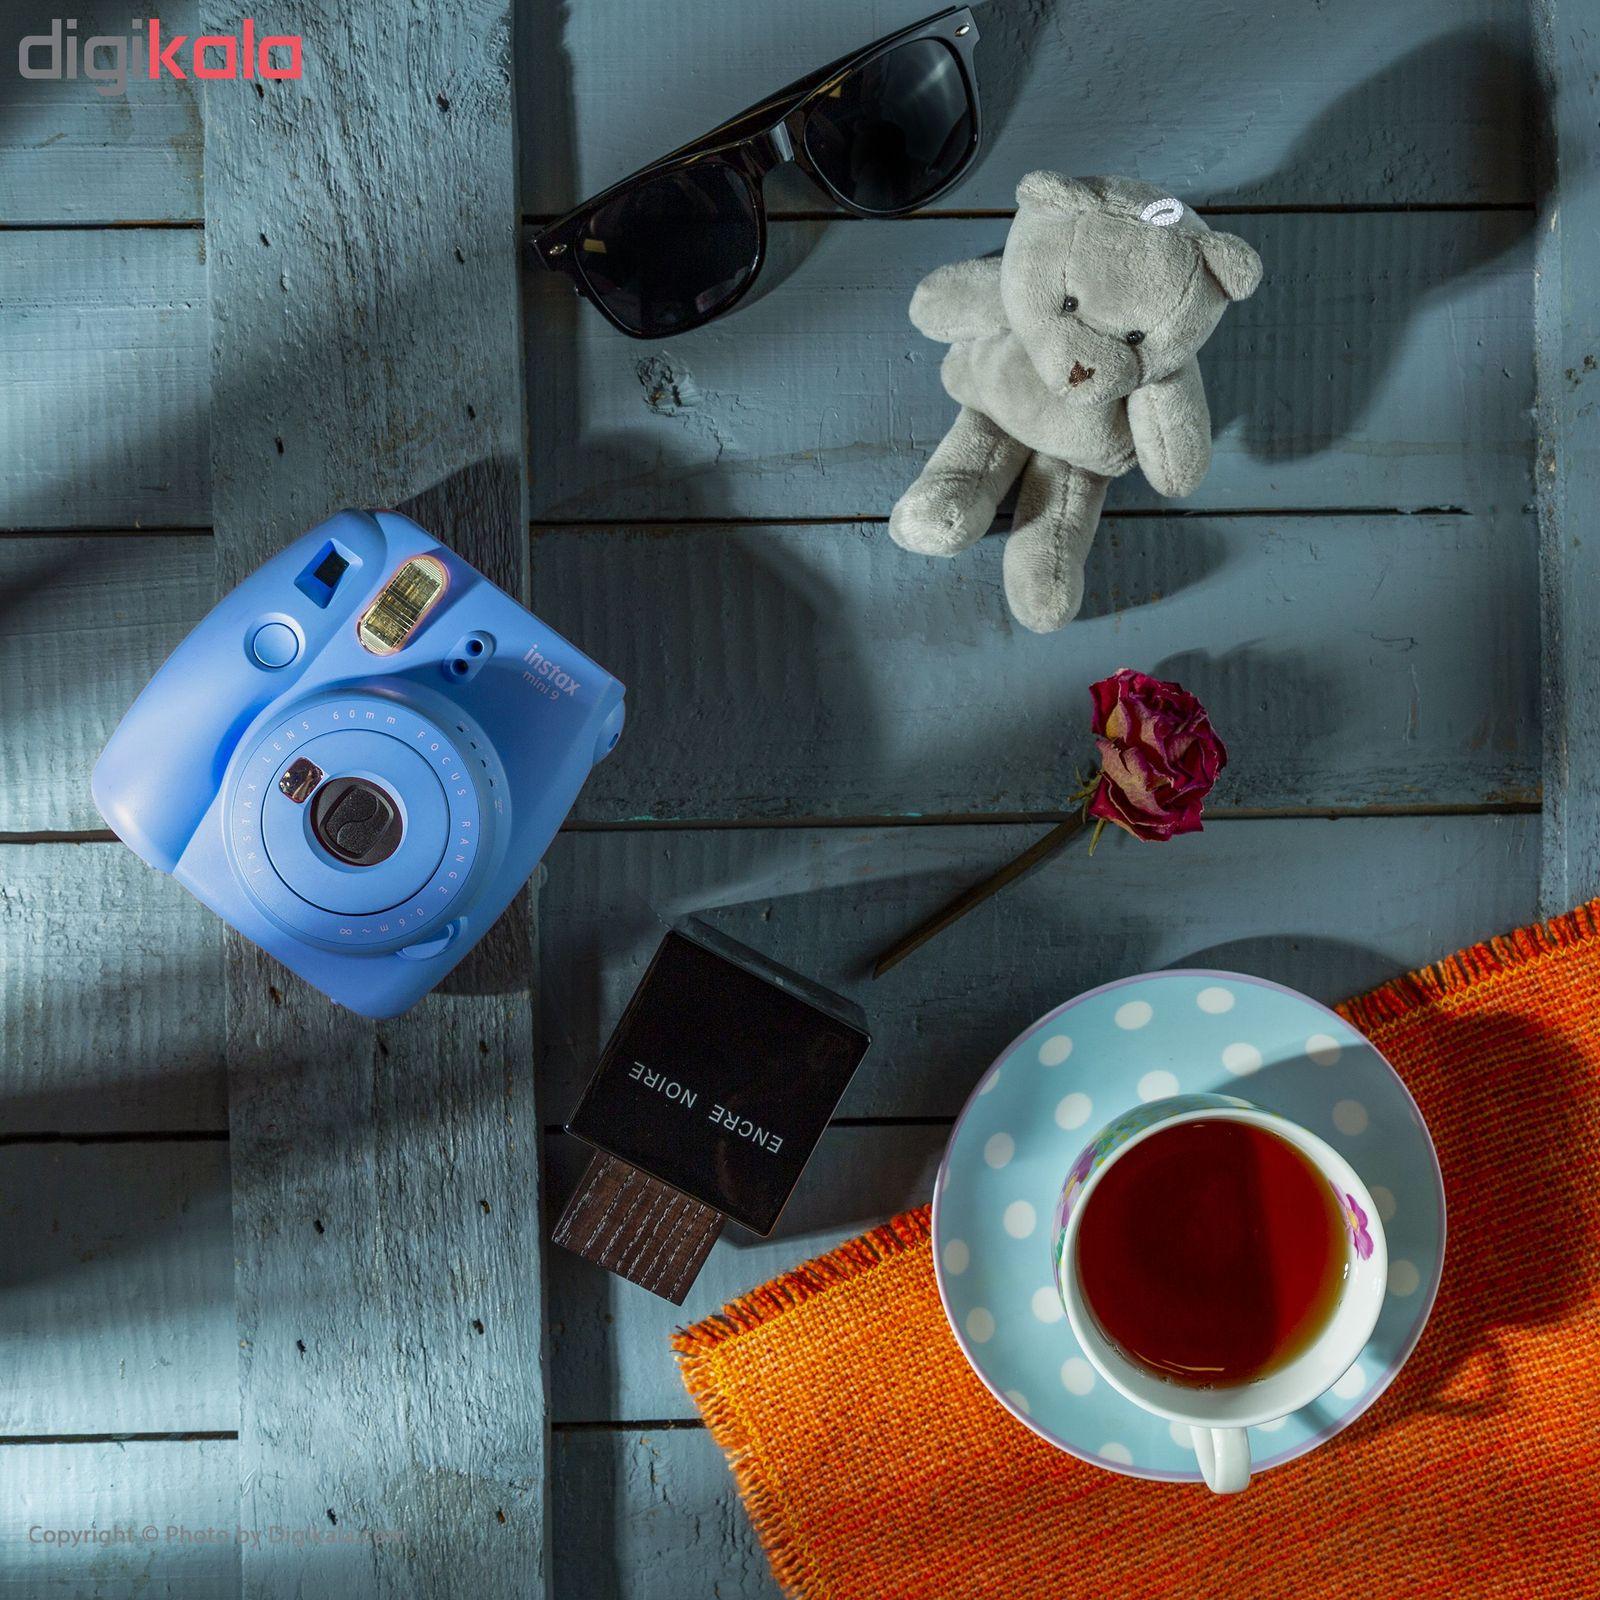 دوربین عکاسی چاپ سریع فوجی فیلم مدل Instax Mini 9 به همراه  فیلم مخصوص main 1 13